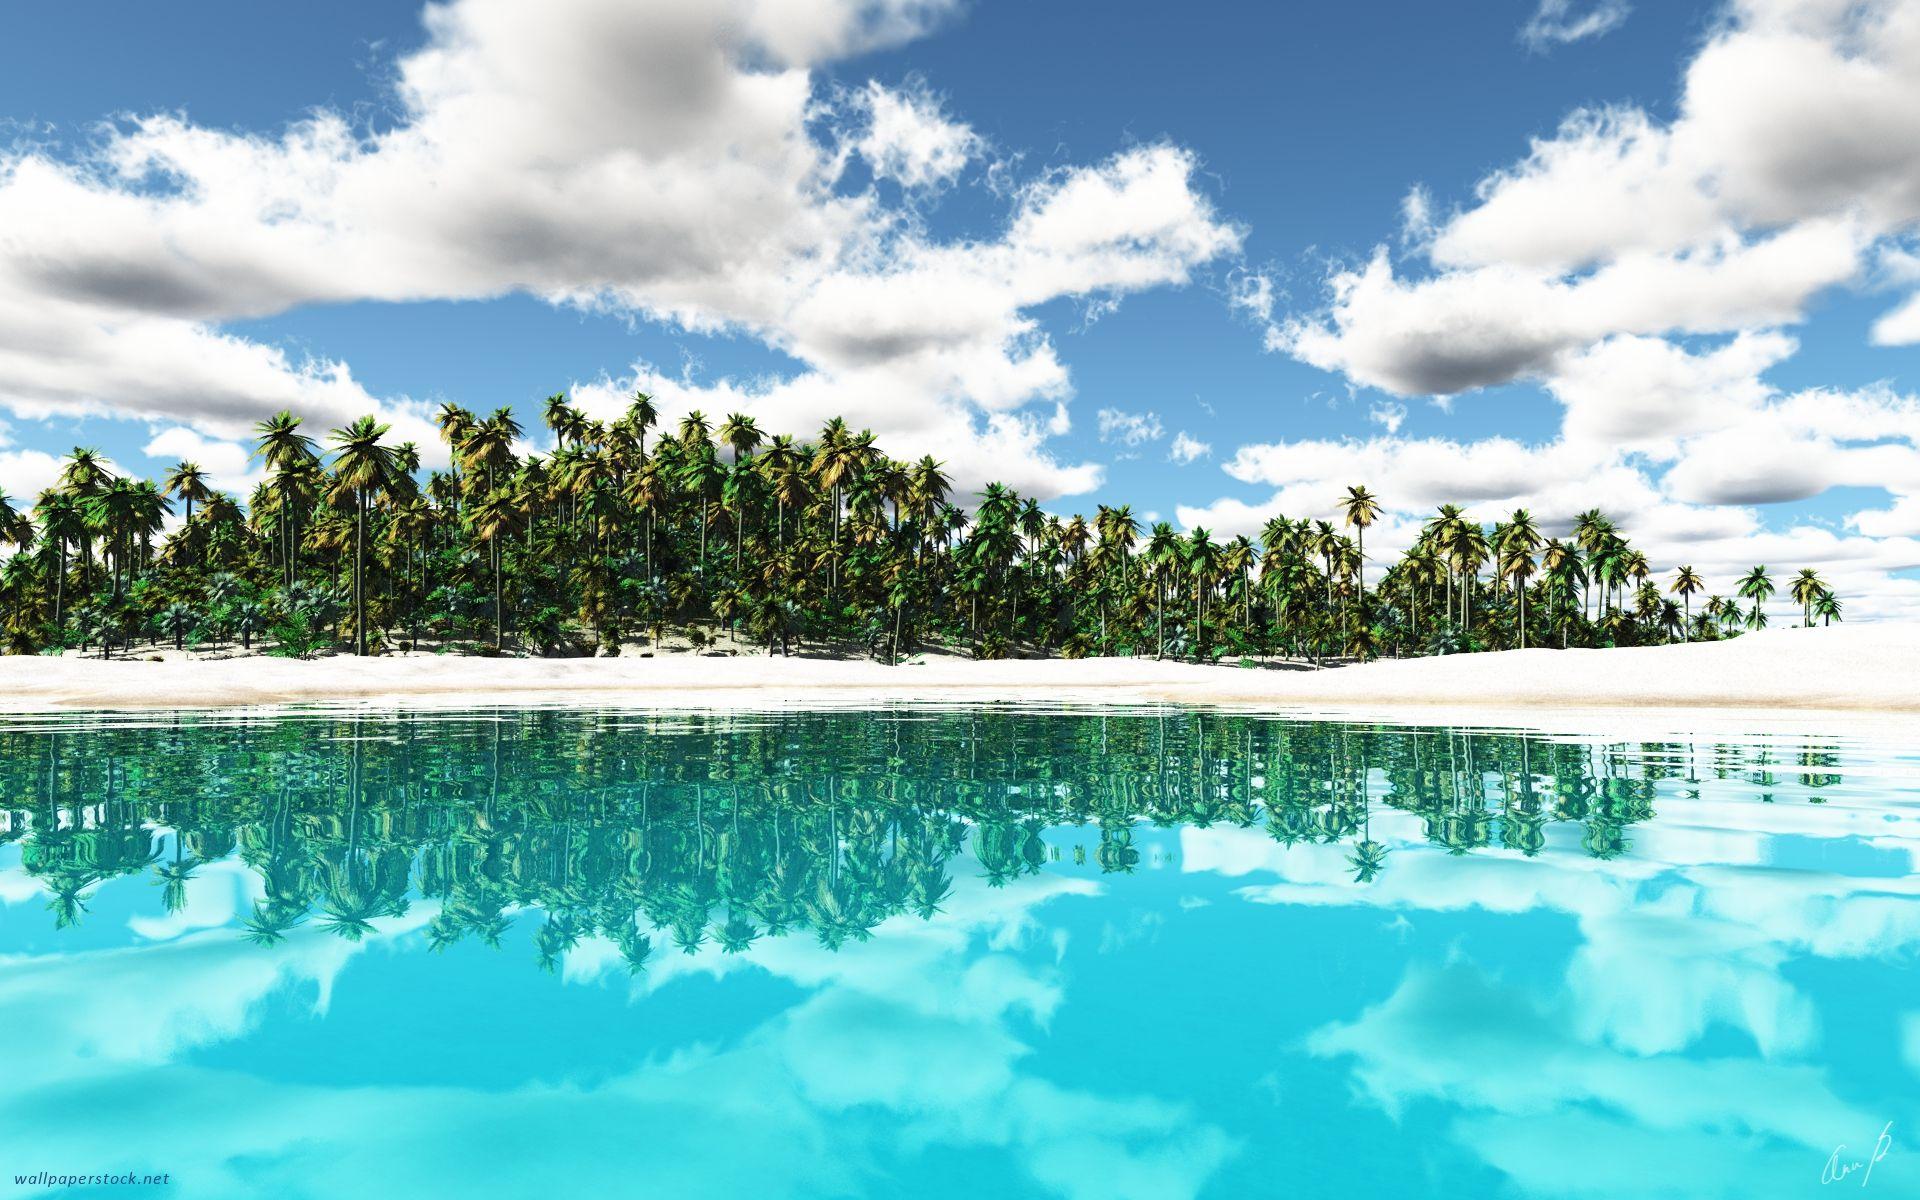 Tropical Island Wallpaper Island Wallpaper Tropical Island Beach Beach Wallpaper Desktop wallpaper beach paradise